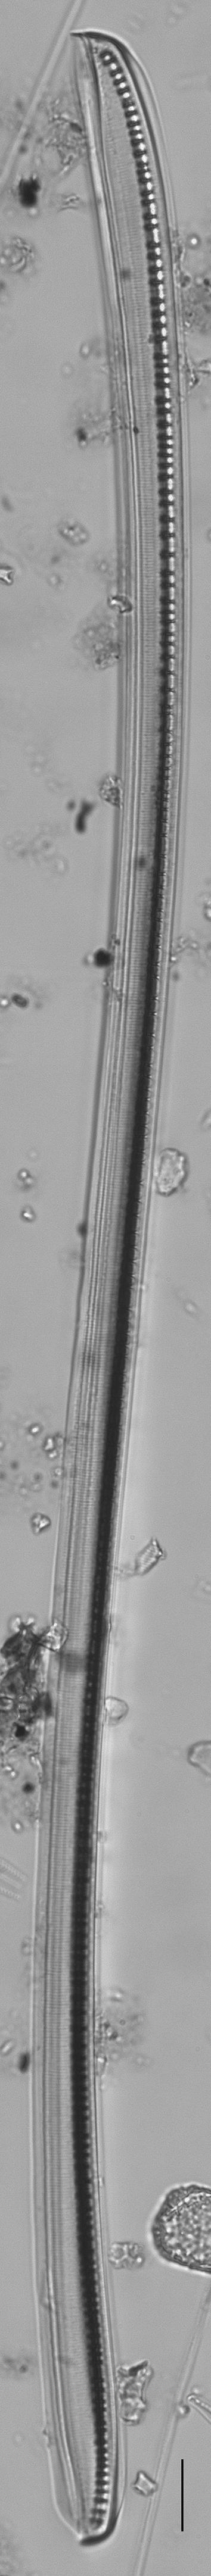 Nitzschia sigmoidea LM3